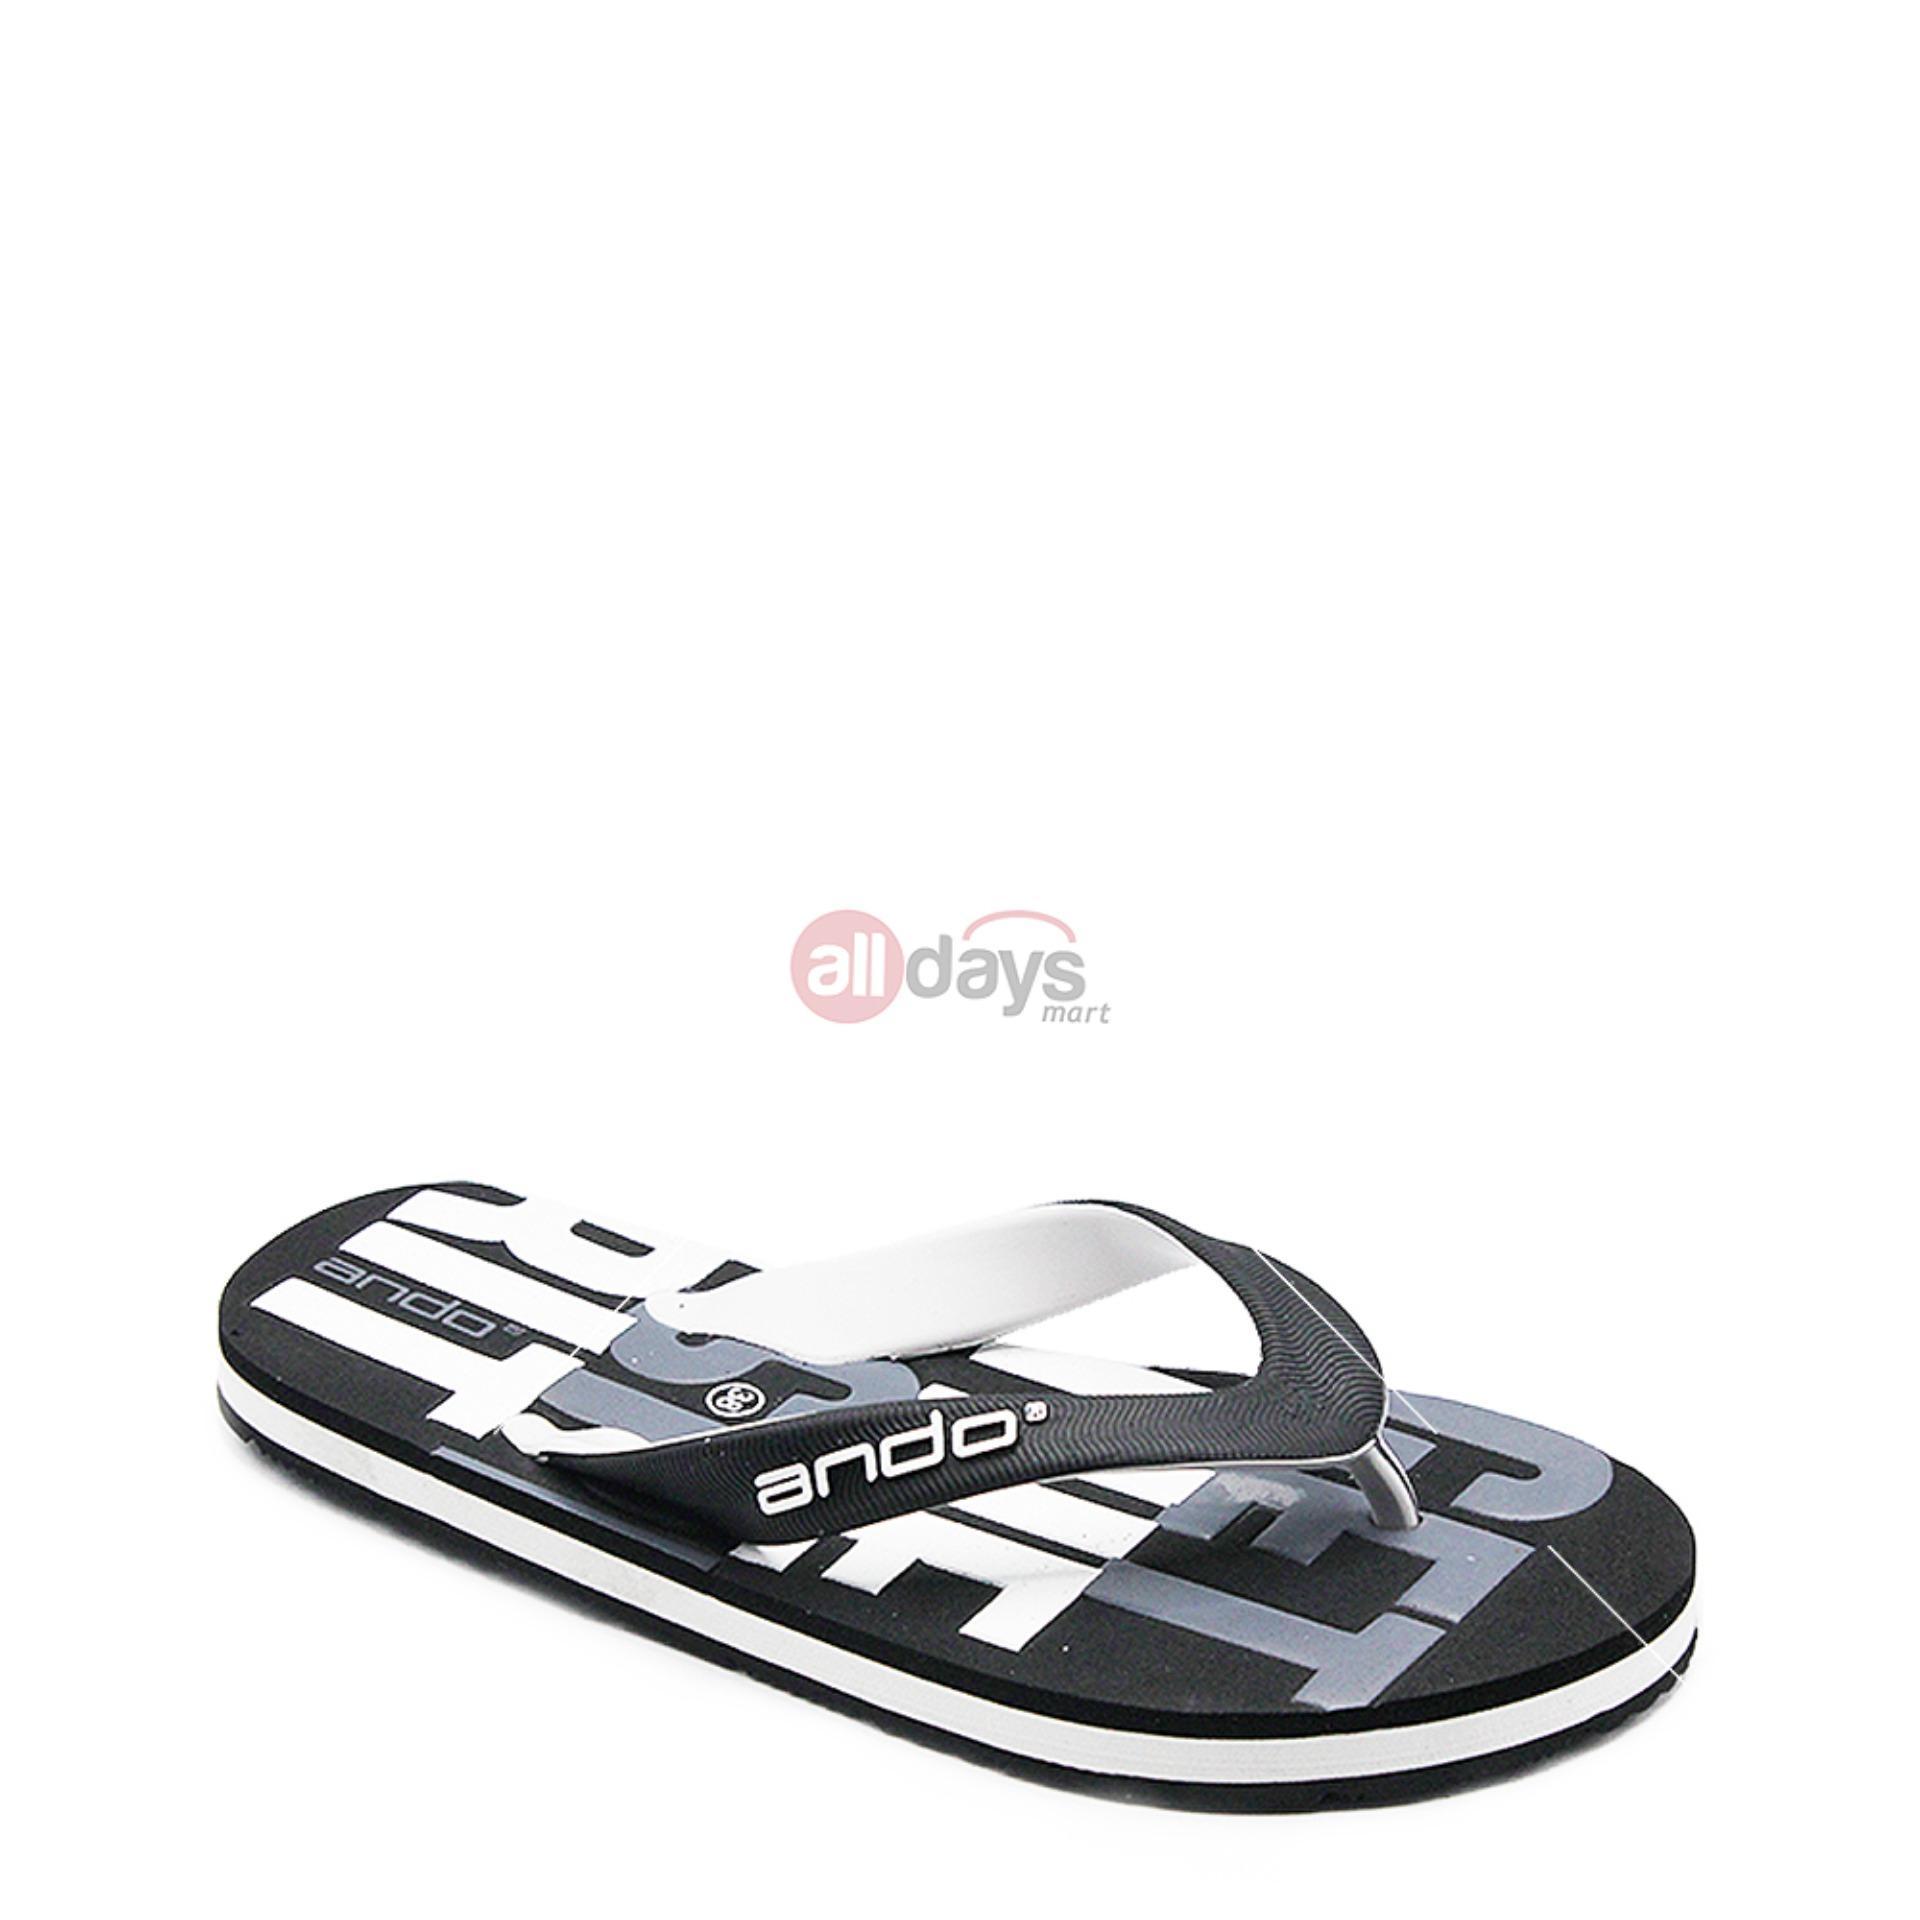 Jual Ando Sandal Jepit Pria Grafitty 02 Black White Size 38 42 Jawa Barat Murah